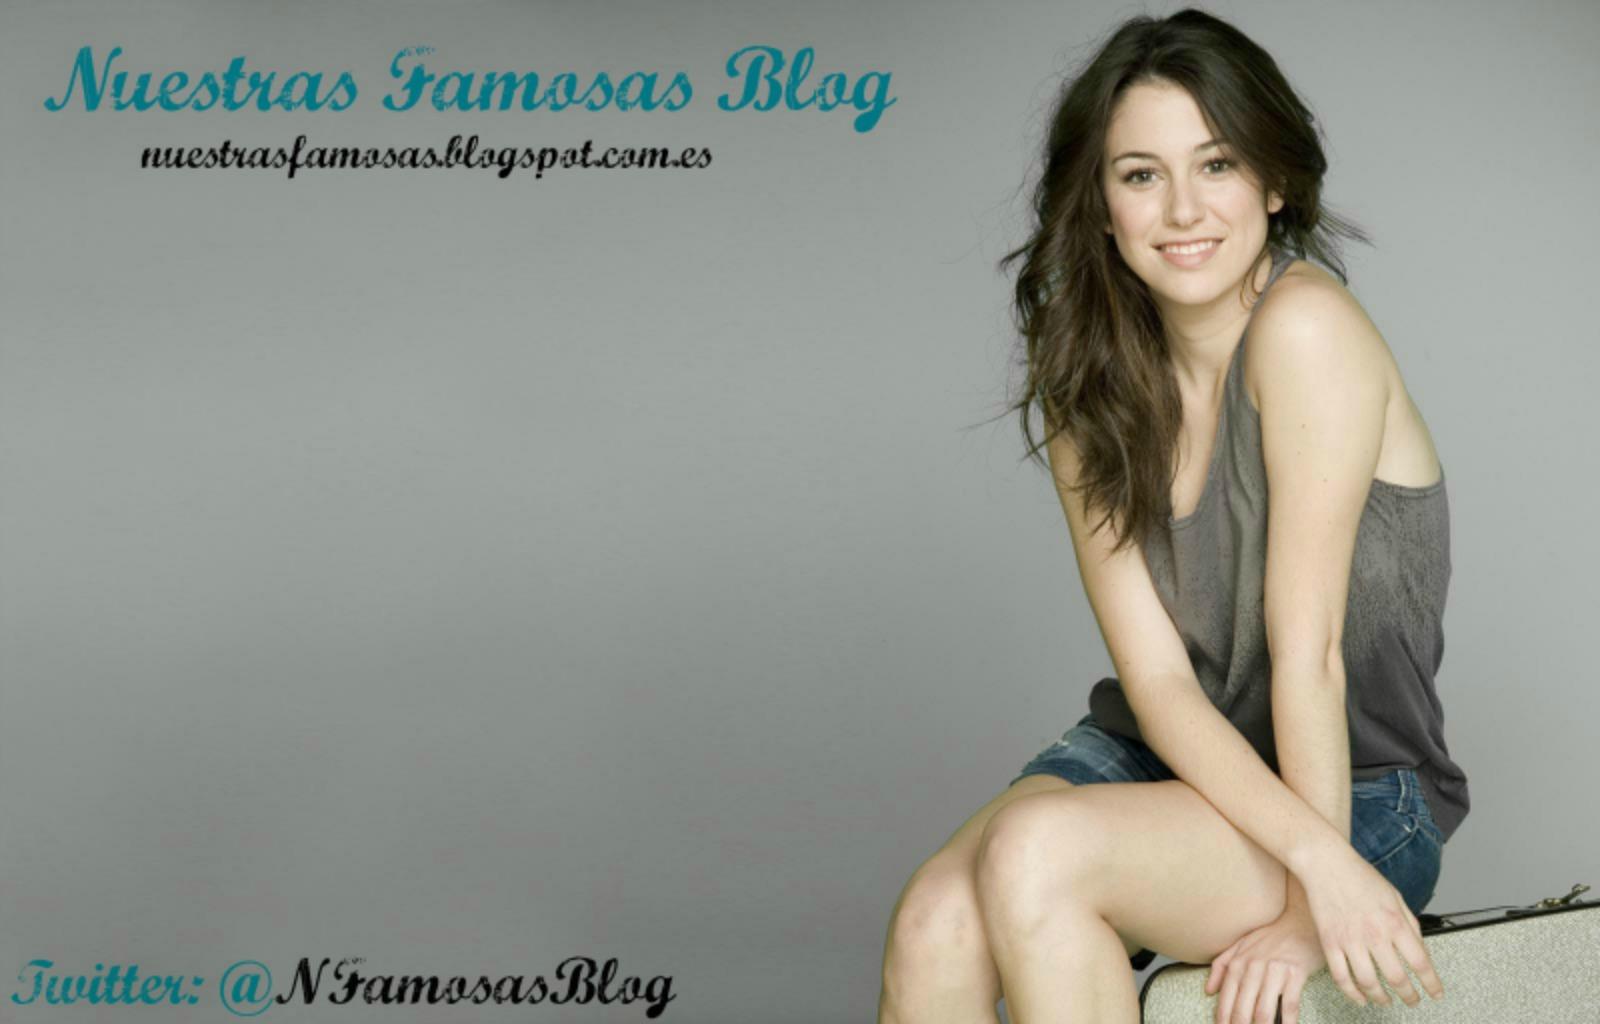 NuestrasFamosasBlog